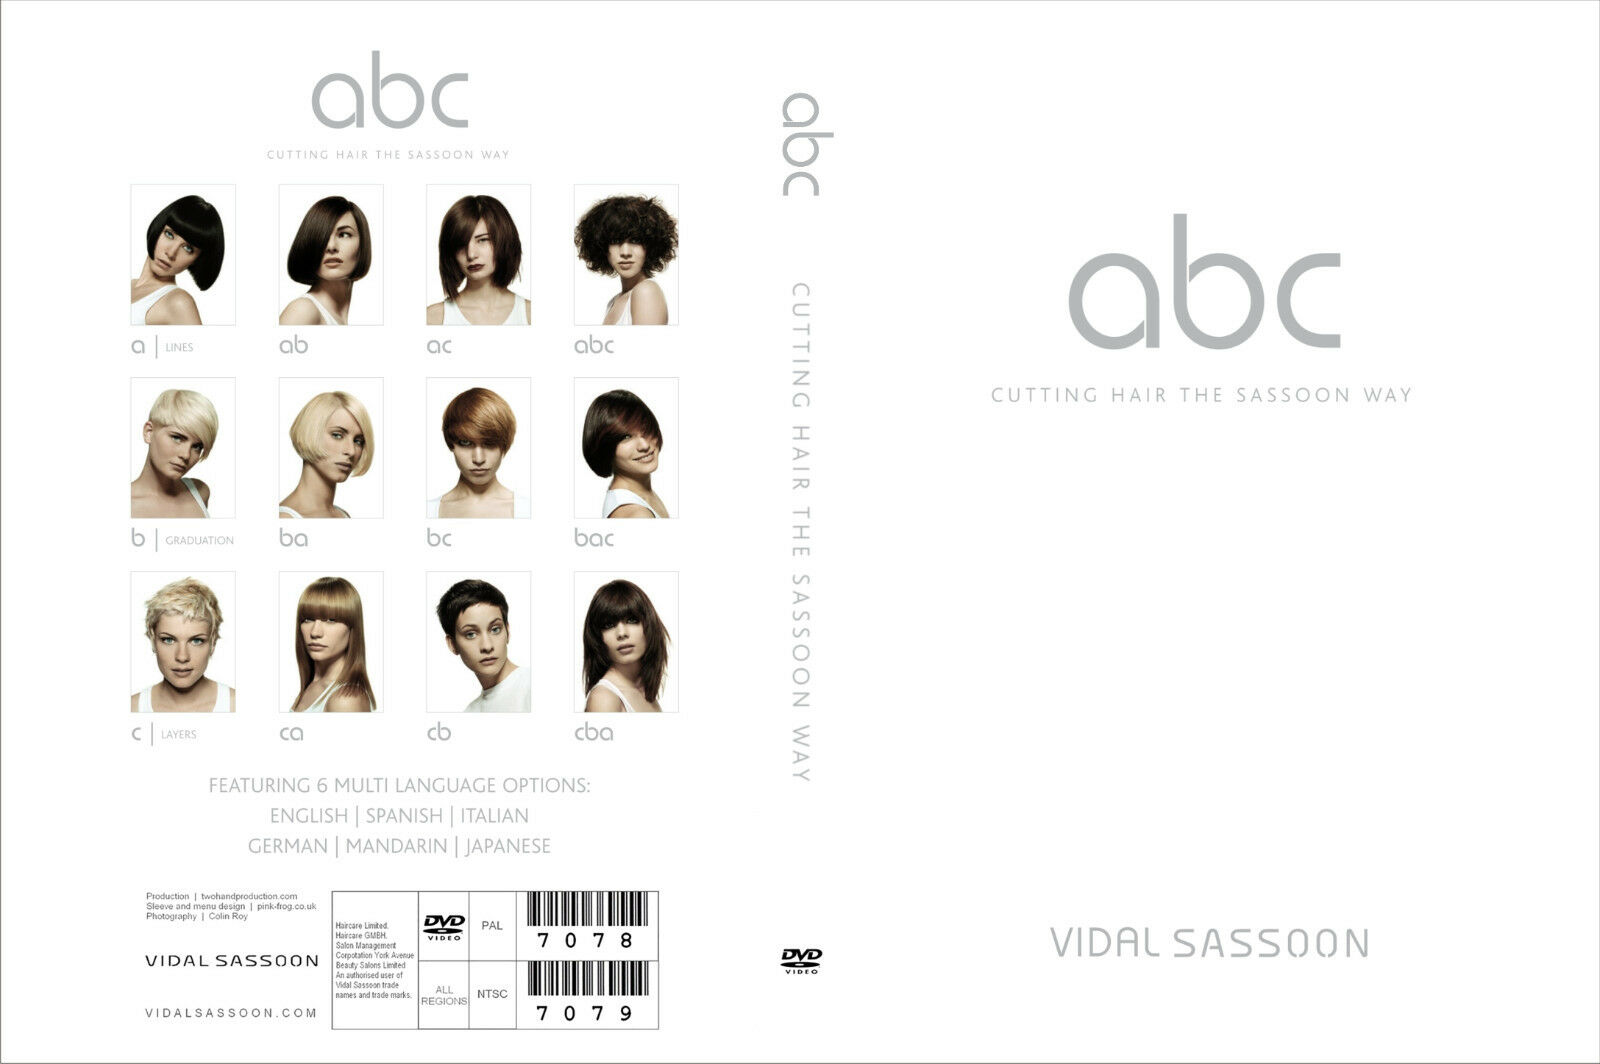 ABC Cutting Hair The Vidal Sassoon Way Education 12 Dvd. Super Training